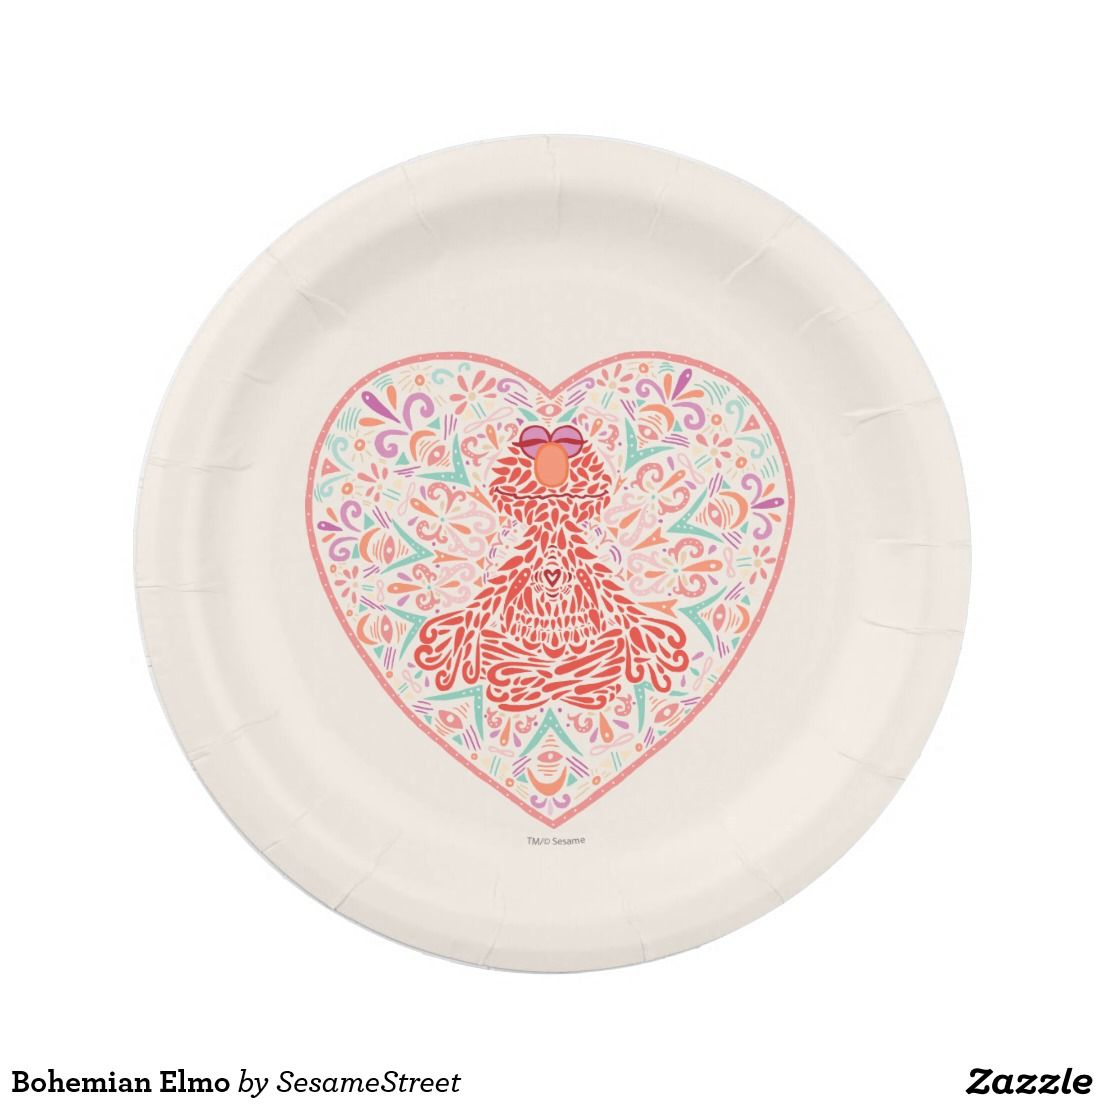 Bohemian Elmo Paper Plate  sc 1 st  Pinterest & Bohemian Elmo Paper Plate | Bohemian Paper and Plates